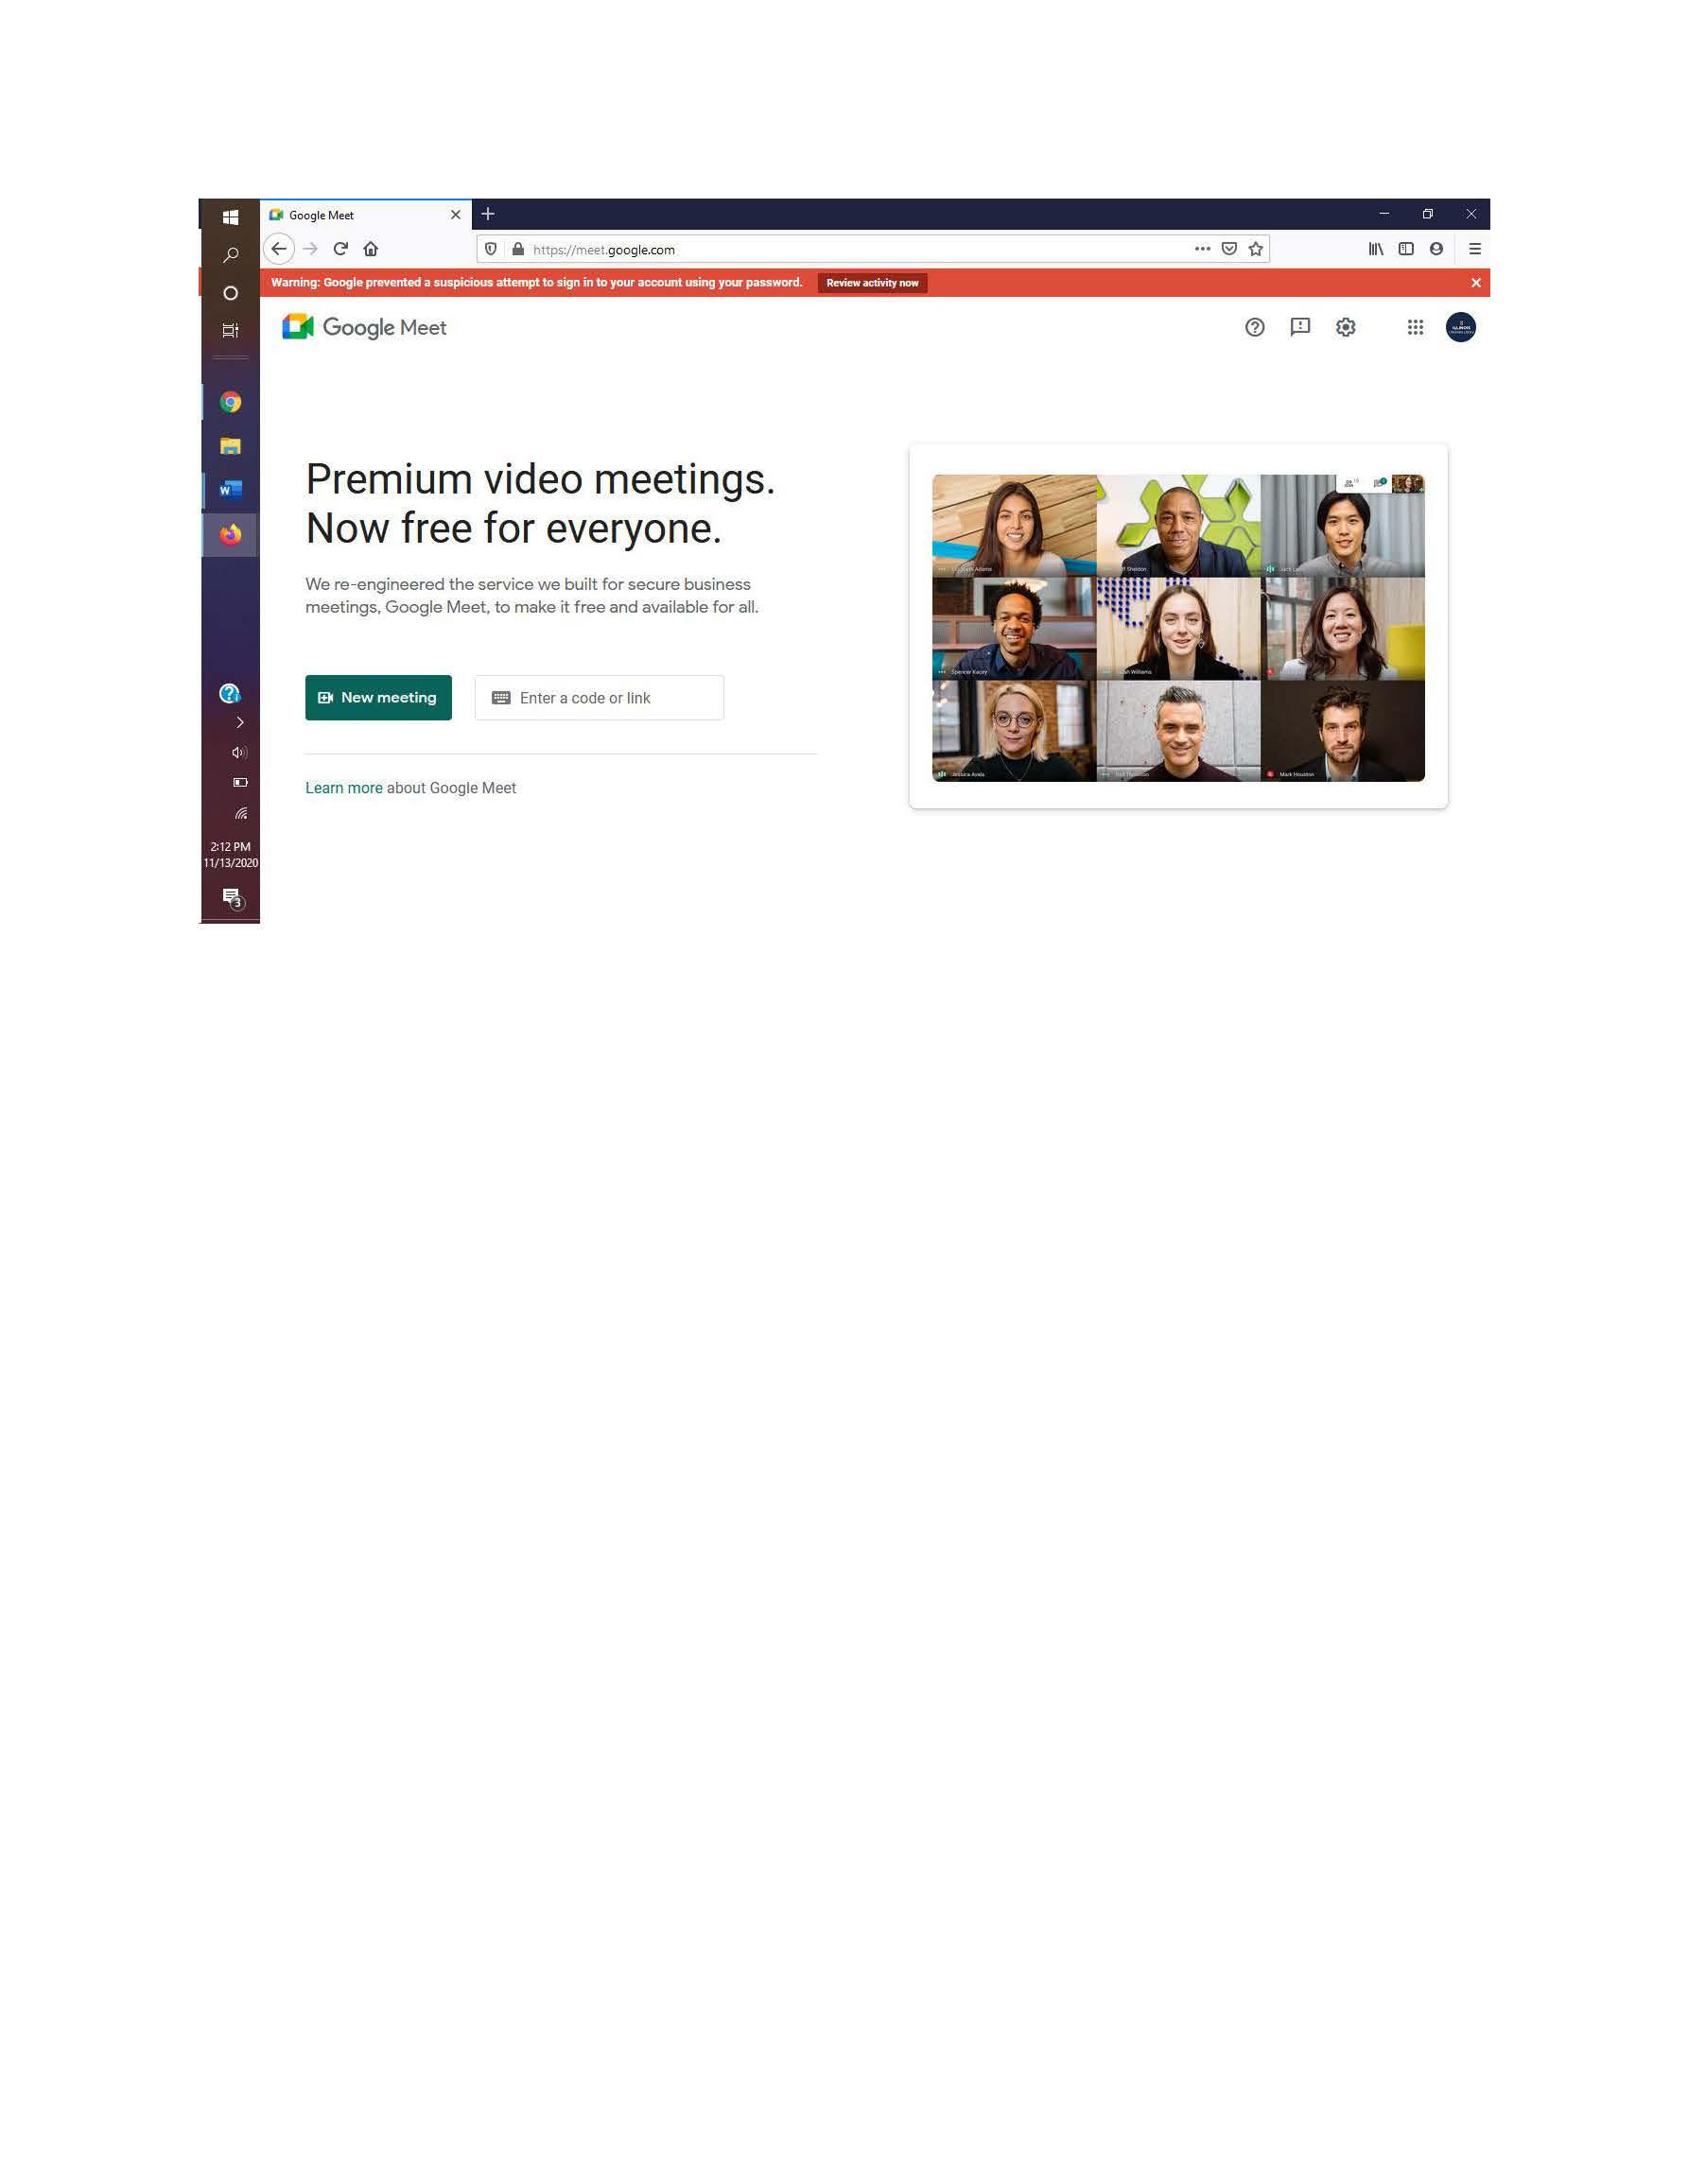 image of the Google Meet's website